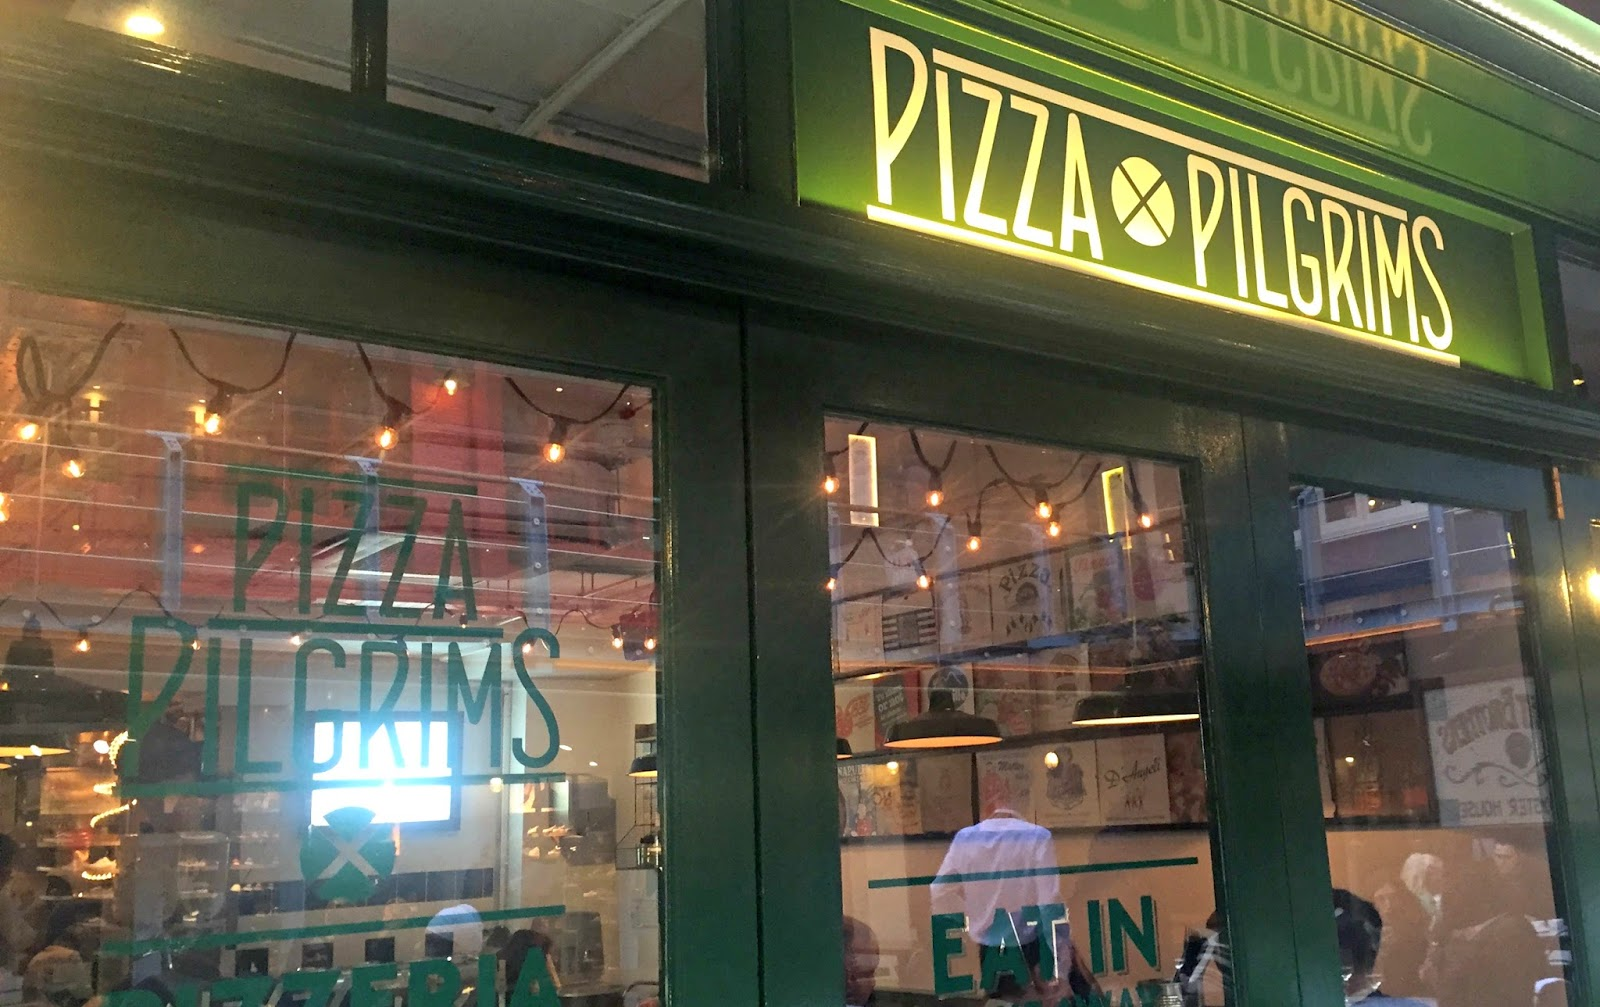 Pizza Pilgrims Kingly Court